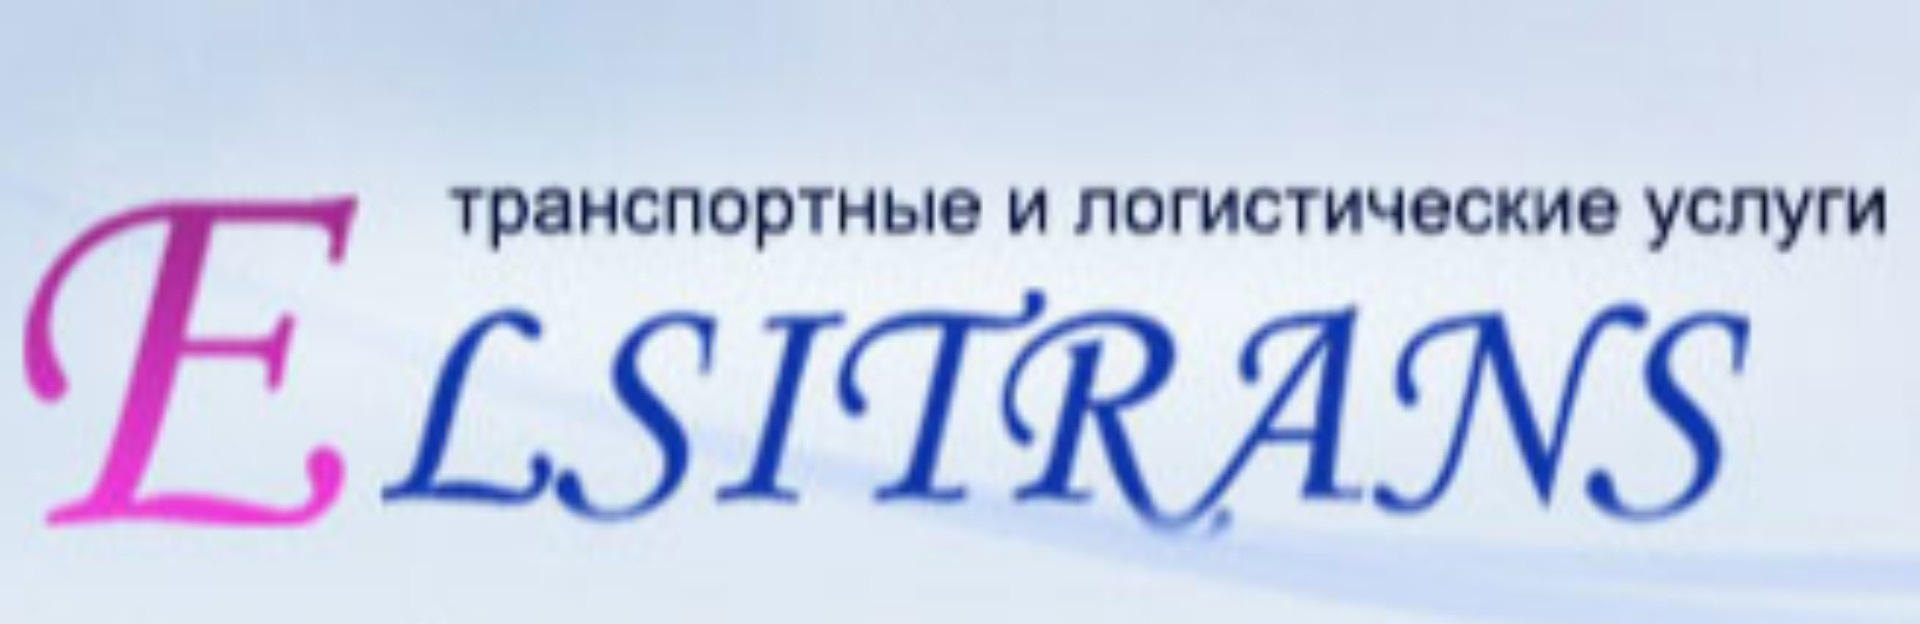 WWW.ELSITRANS.RU